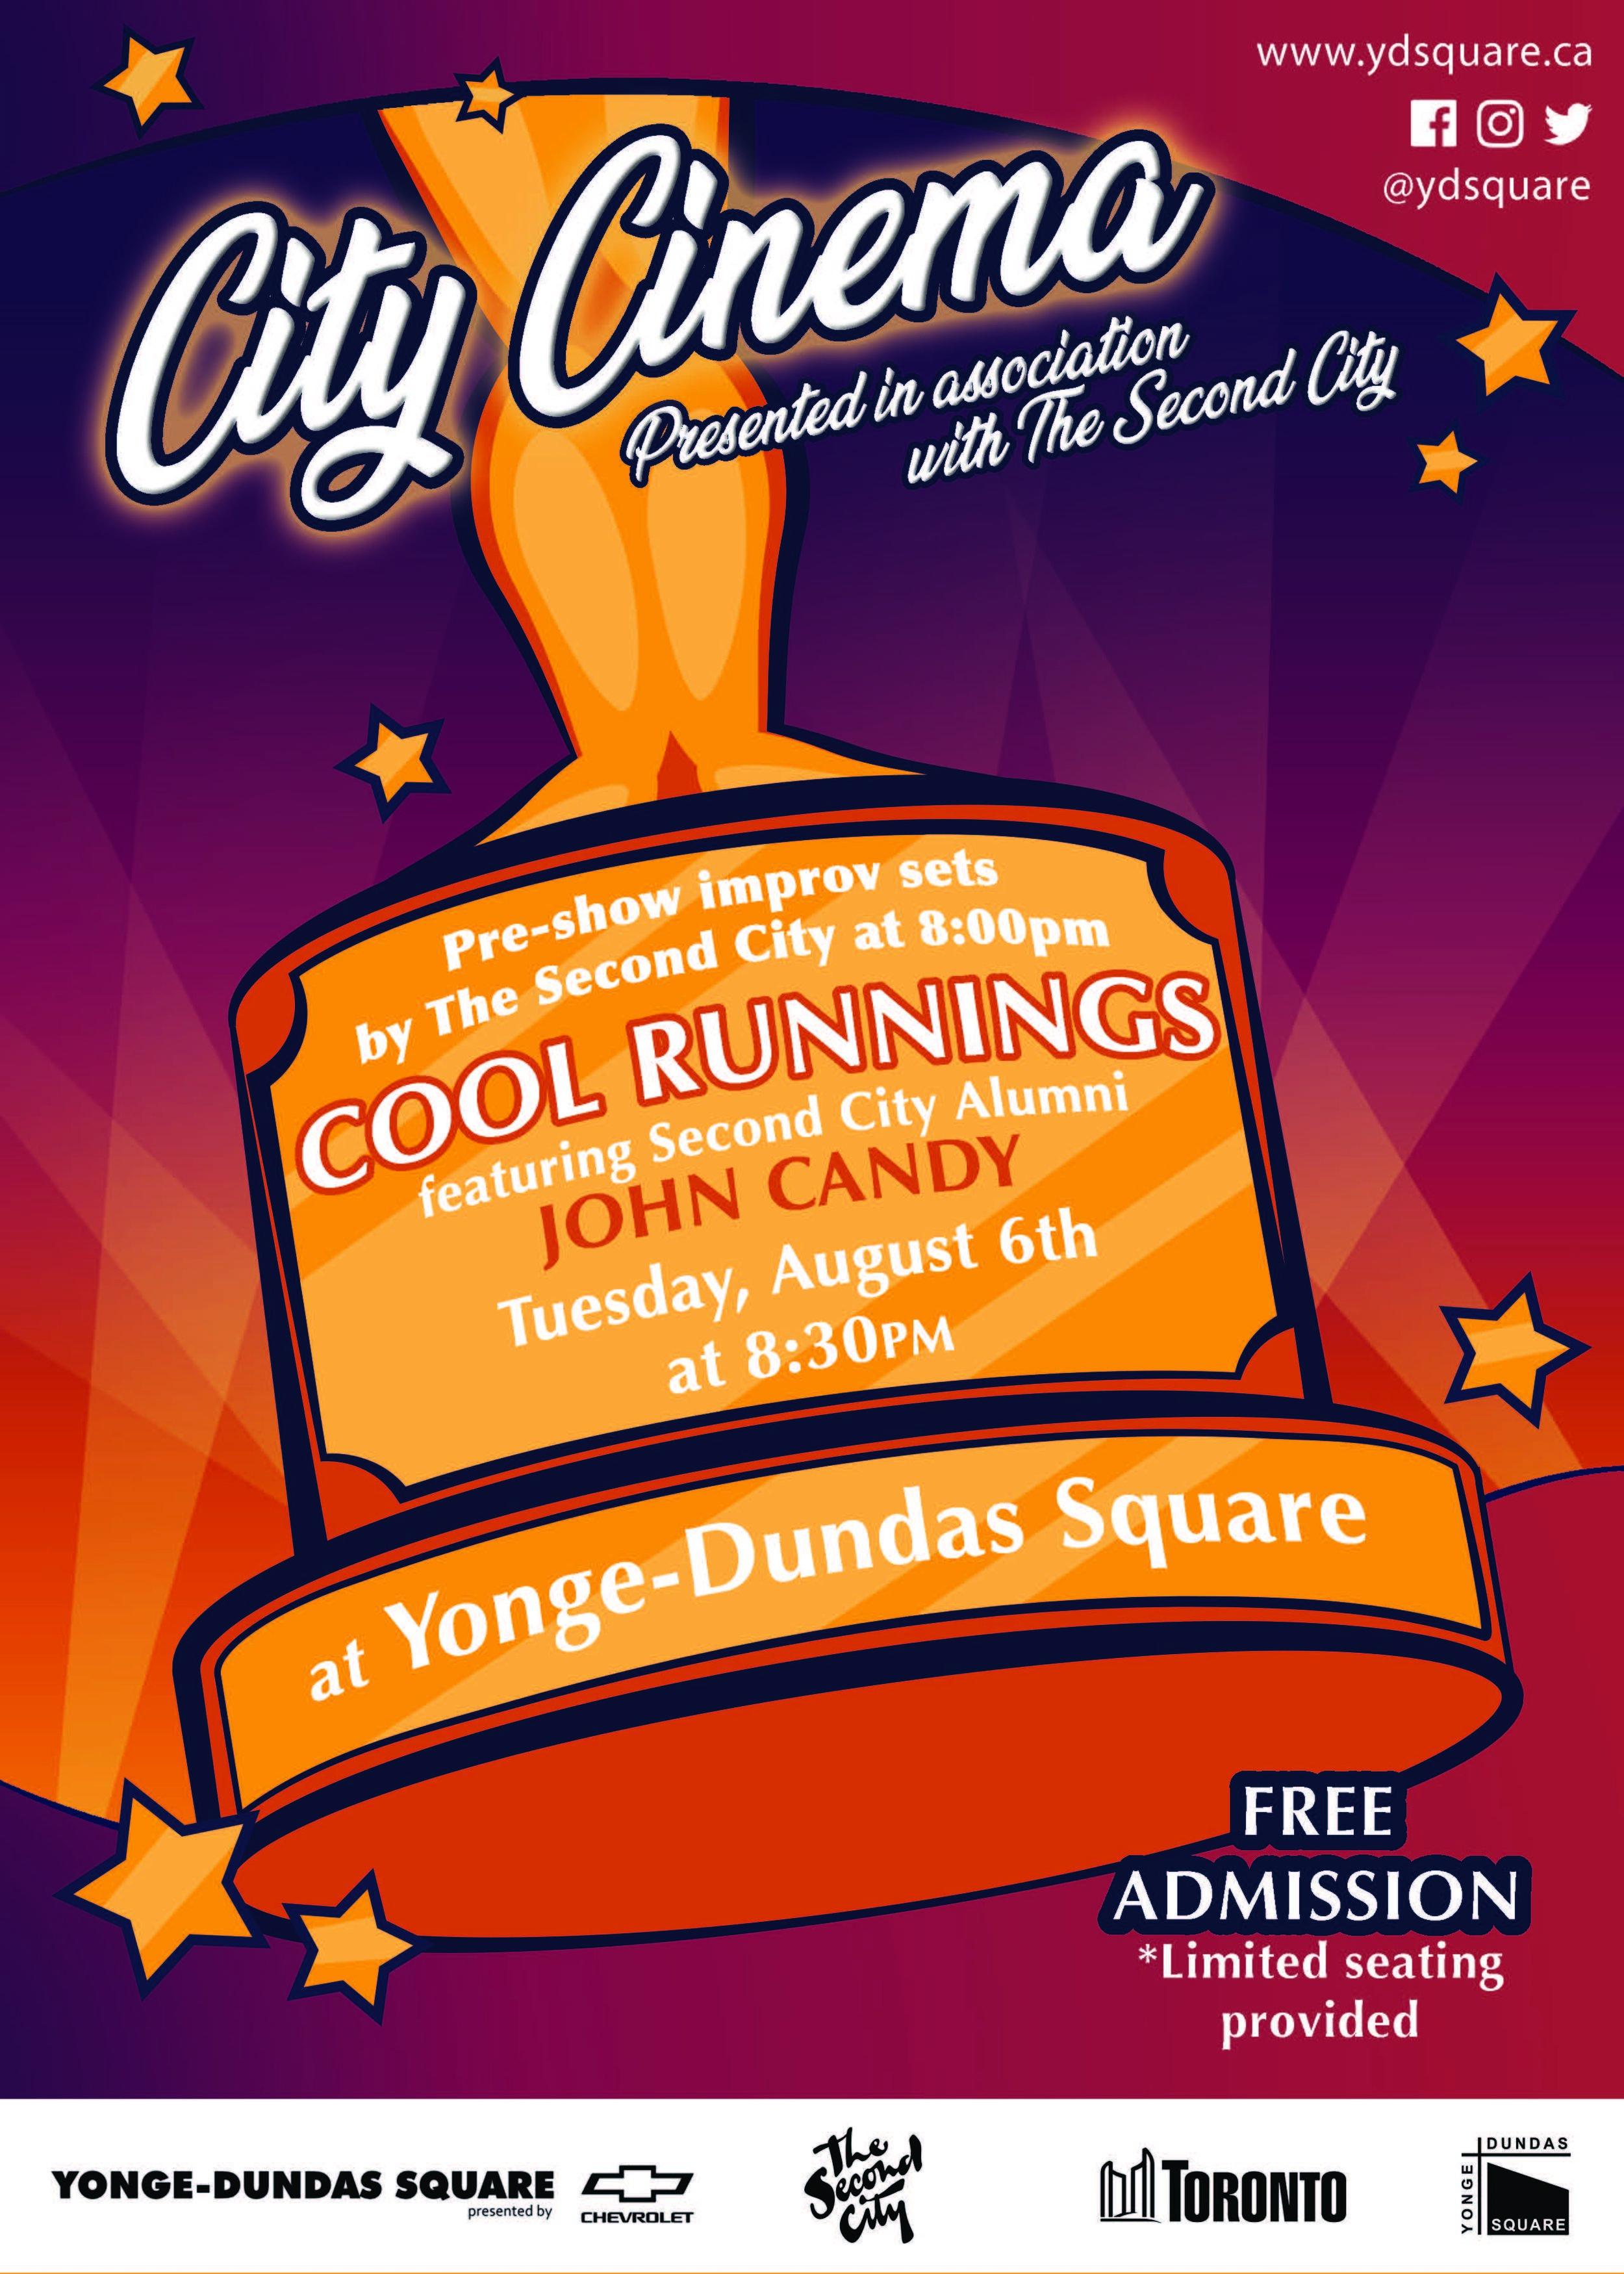 City Cinema Cool Runnings Poster.jpg